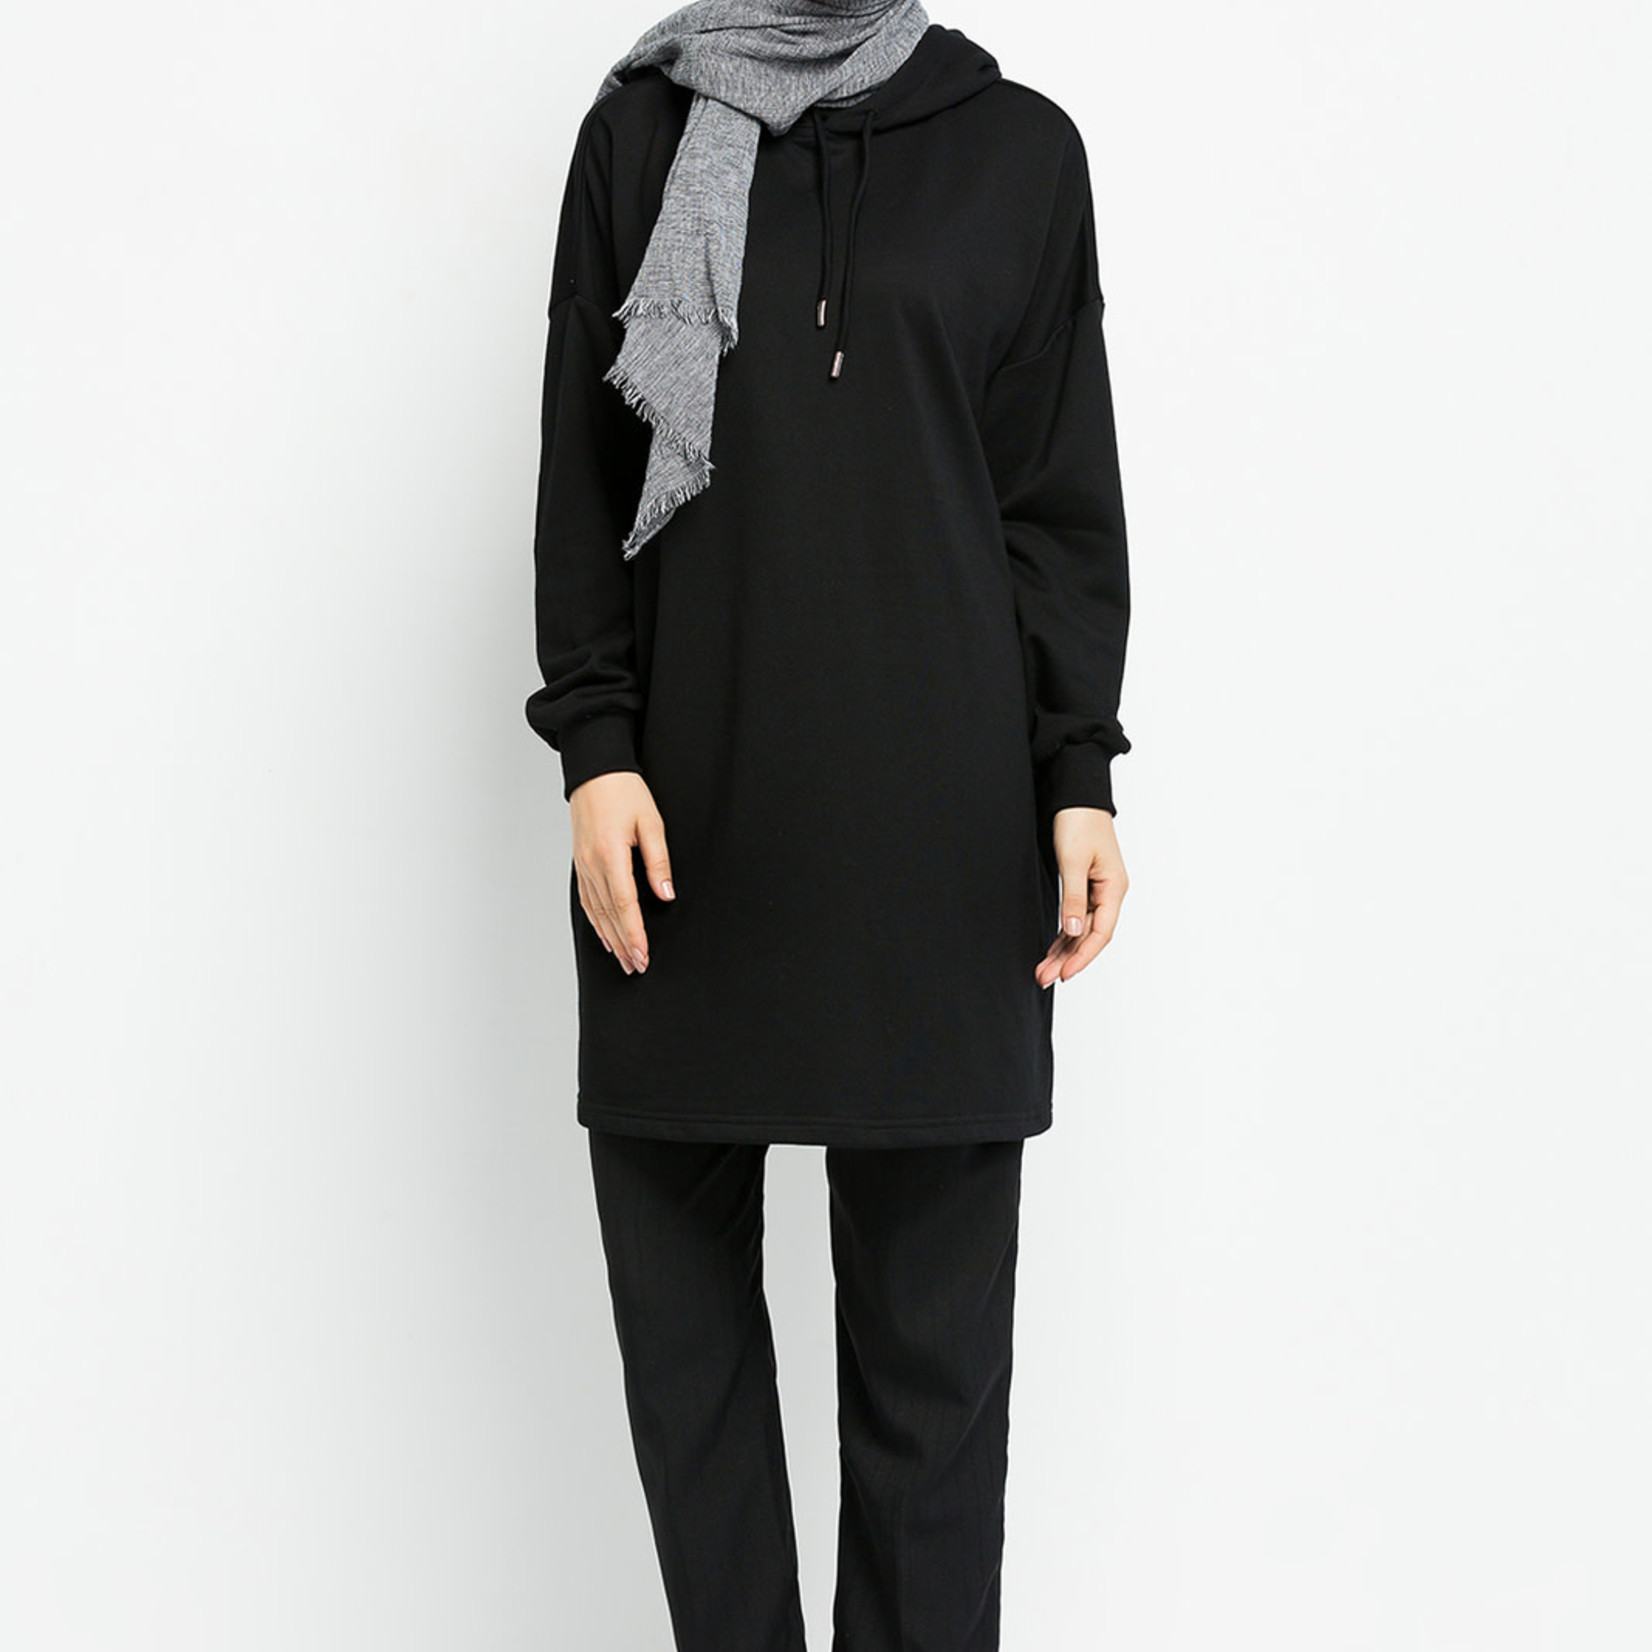 Hijab House Black Oversized Jumper